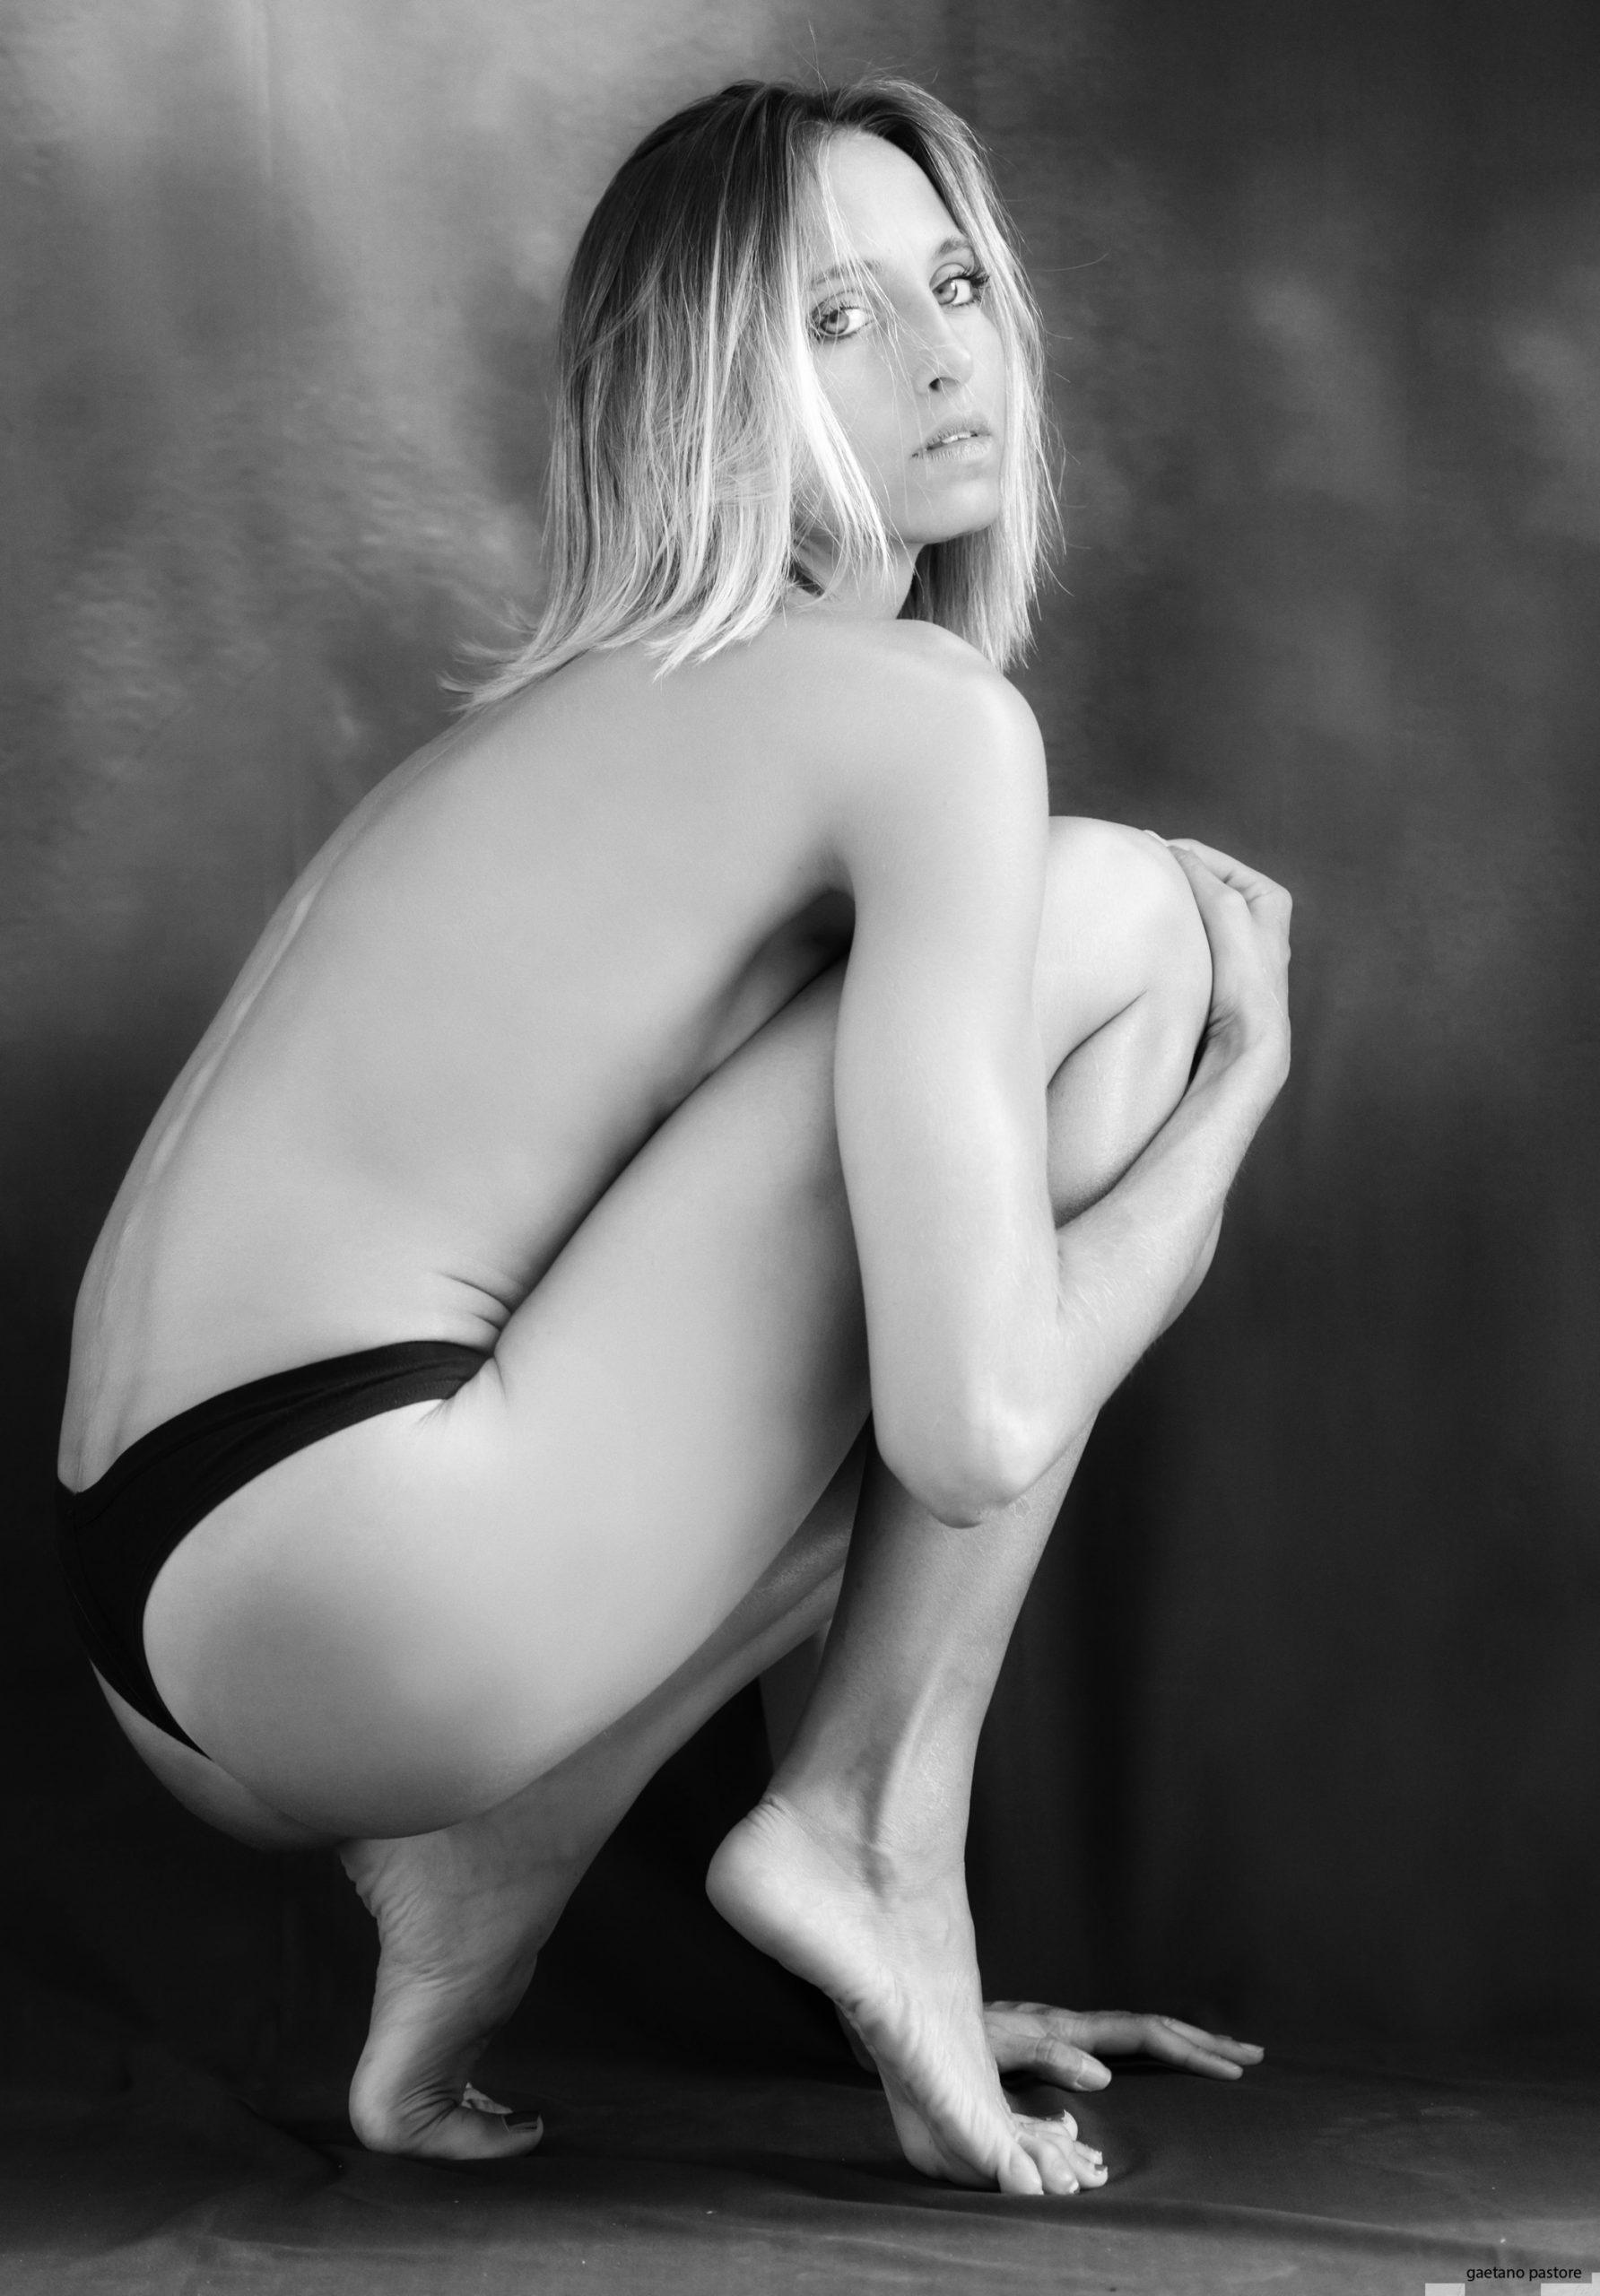 Categorie: Boudoir & Nude. Glamour, Portrait - Photographer: GAETANO PASTORE - Model: SOFIA MACINANTI - Location: Roma, RM, Italia